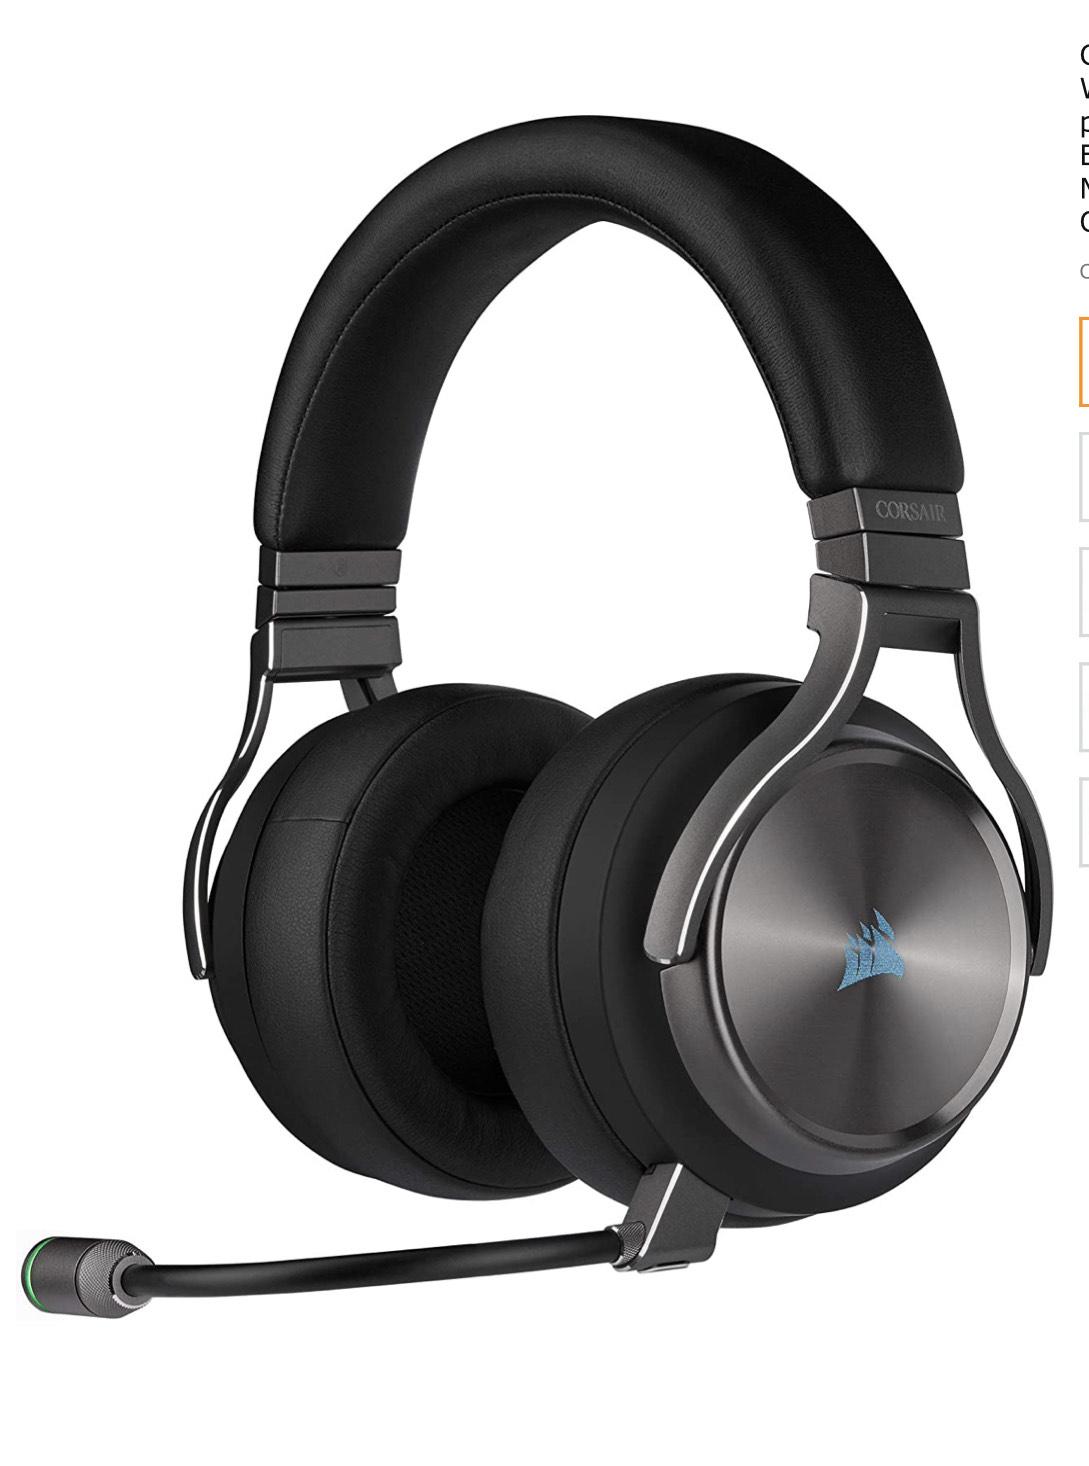 Corsair VIRTUOSO RGB WIRELESS SE, Auriculares para Juegos de Alta Fidelidad, Envolvente e Inmersivo 7.1